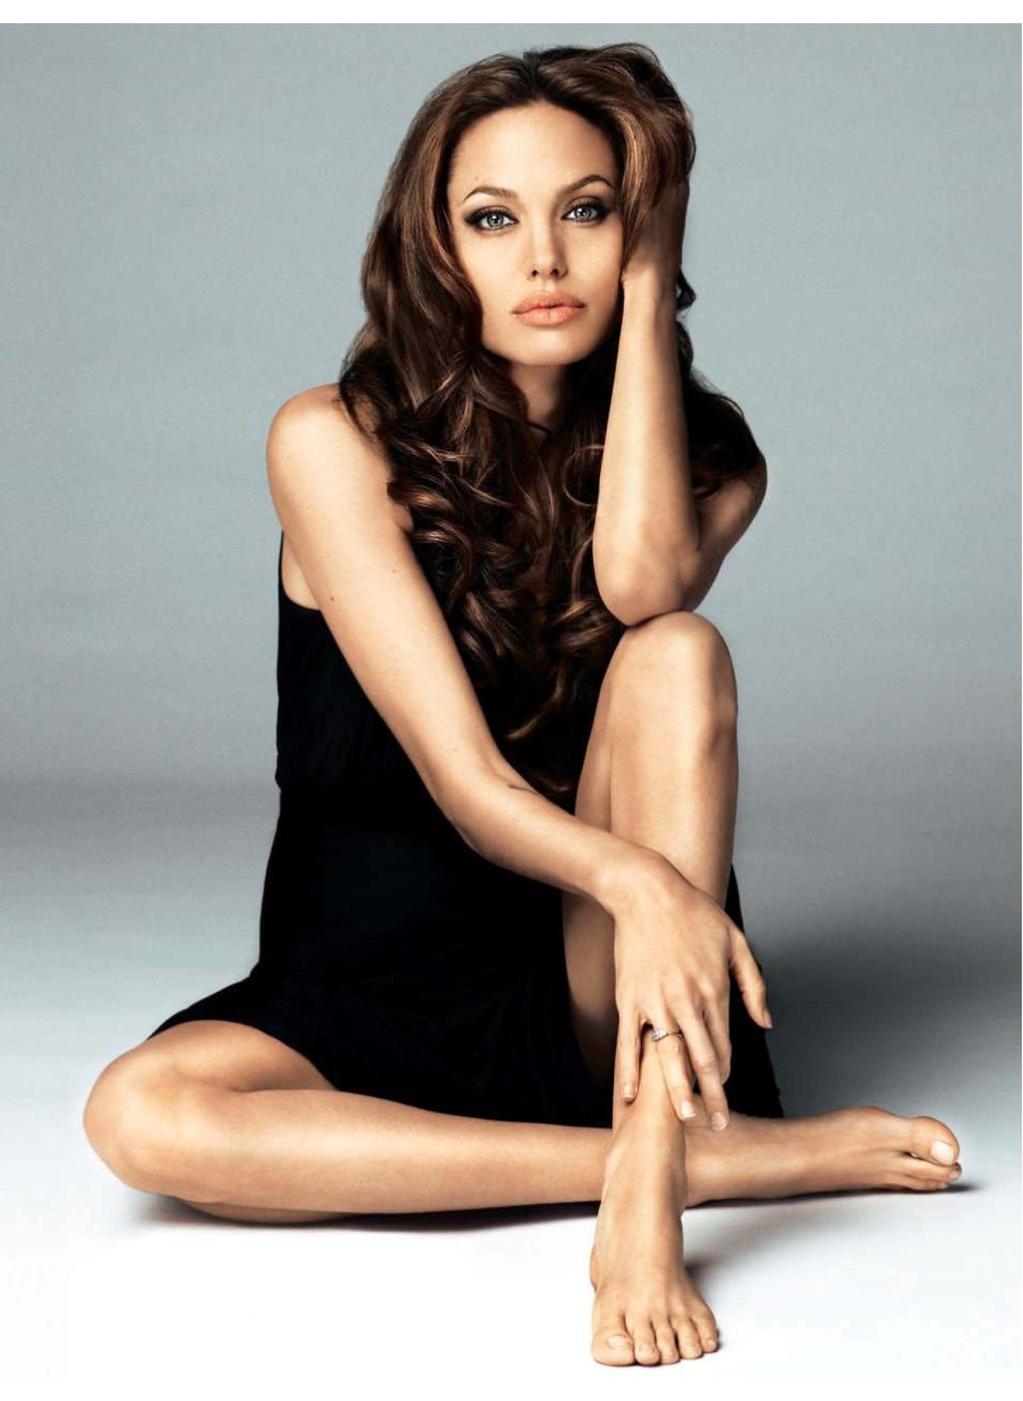 Jolie Magazine November 2017 Issue: Interview Questions: Angelina Jolie